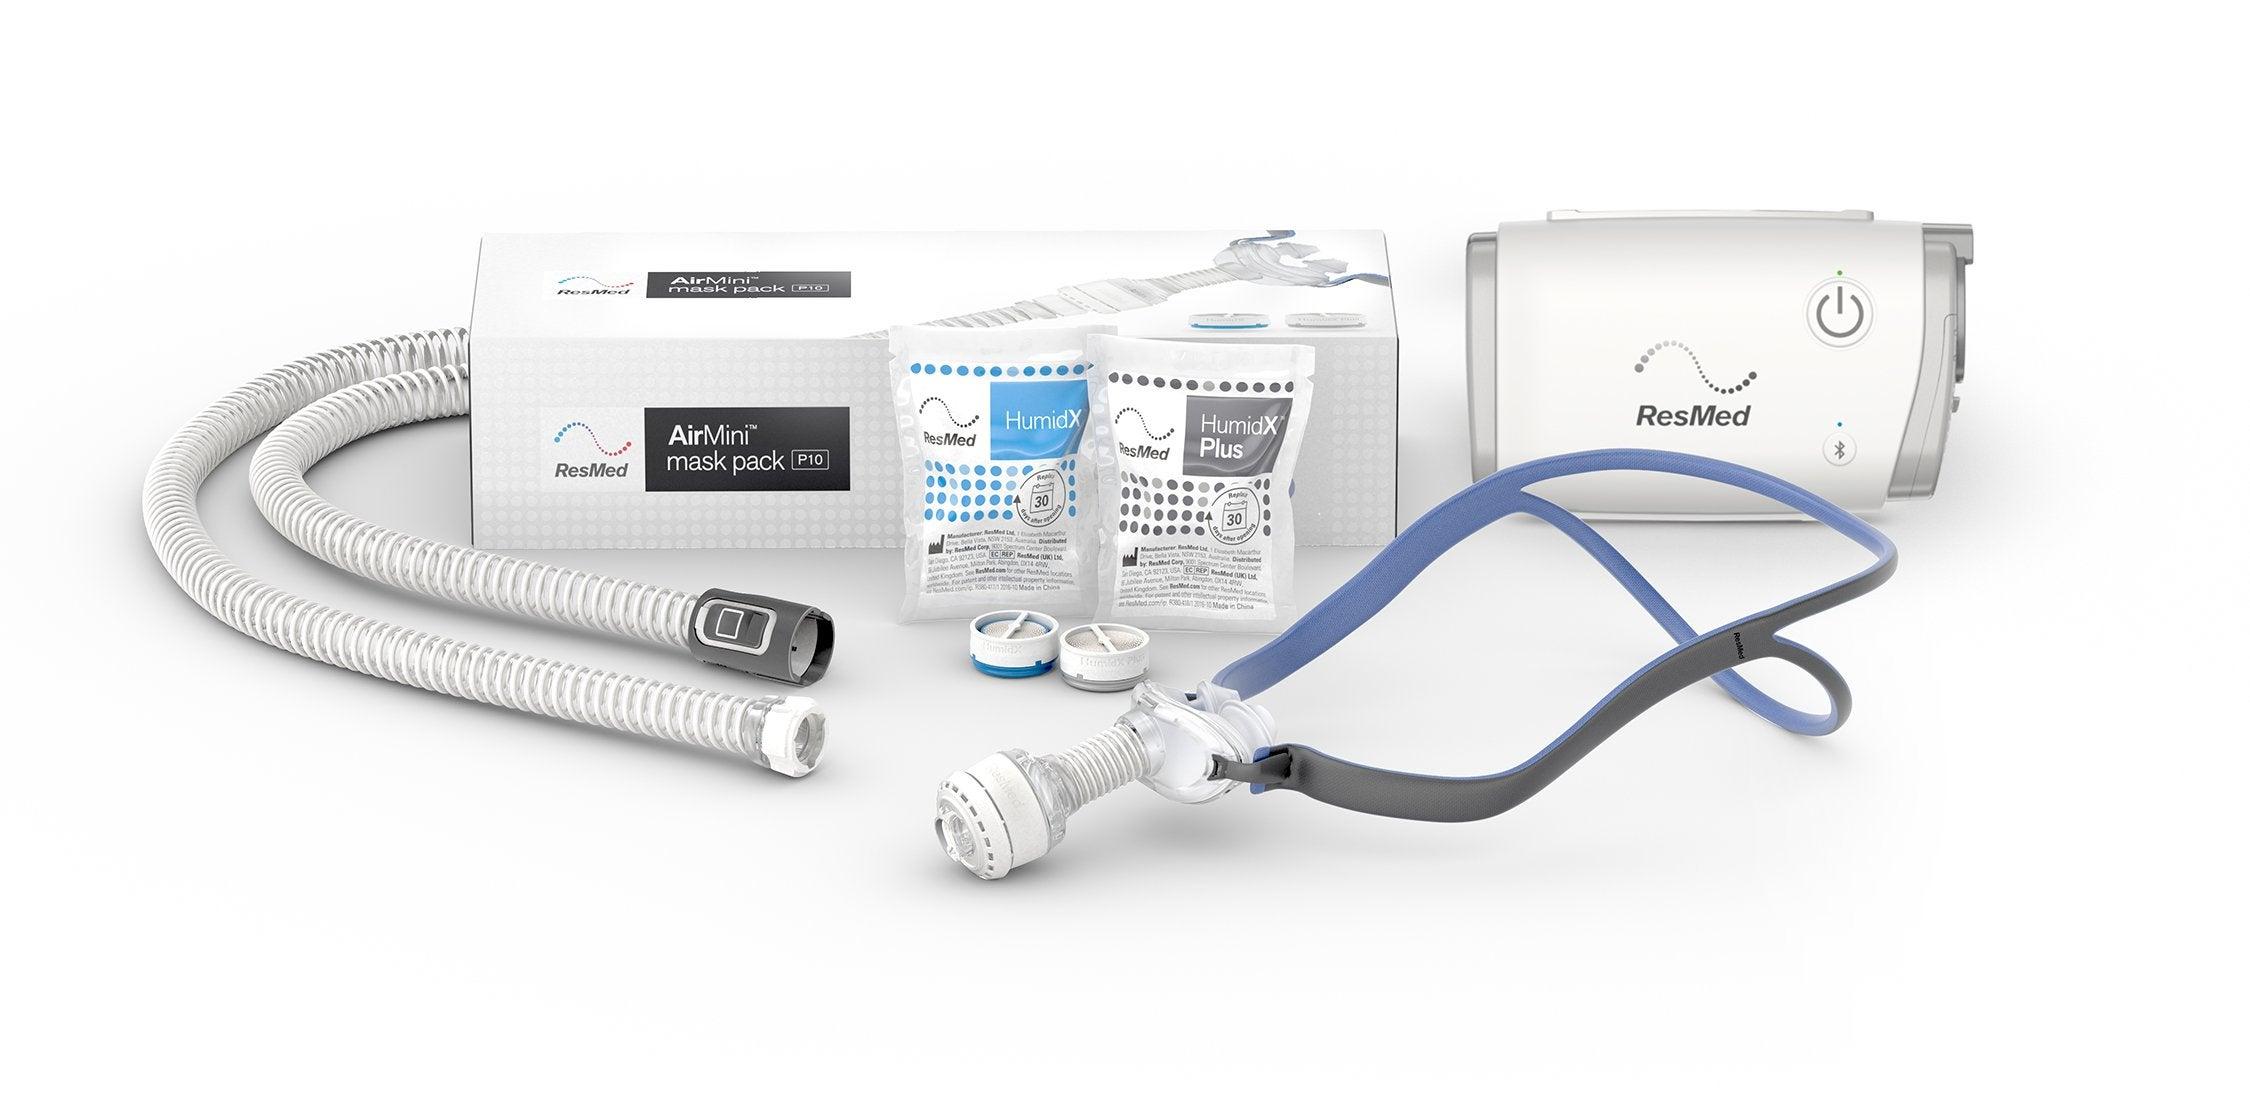 AirMini AutoSet CPAP Machine with Free AirFit P10 Mask